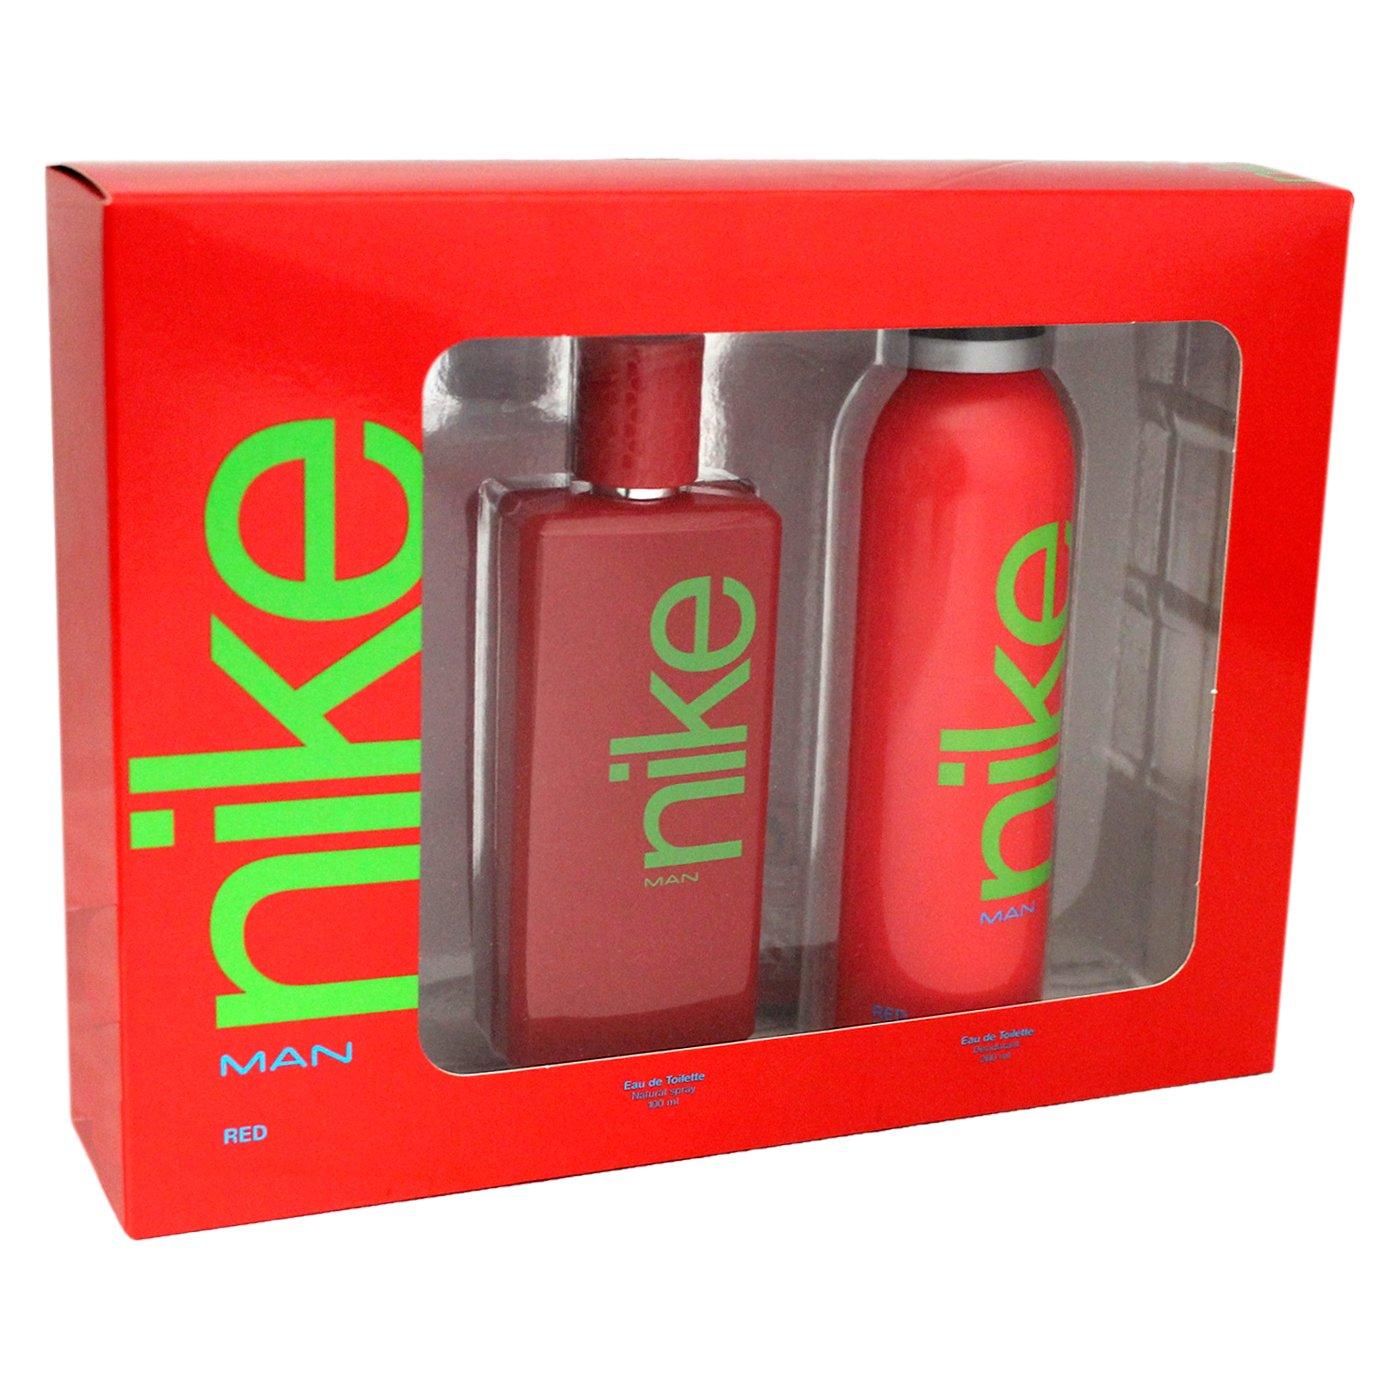 413b94e069e1a Nike Red Man Edt 100 VP + Deo 200 VP: Amazon.co.uk: Beauty